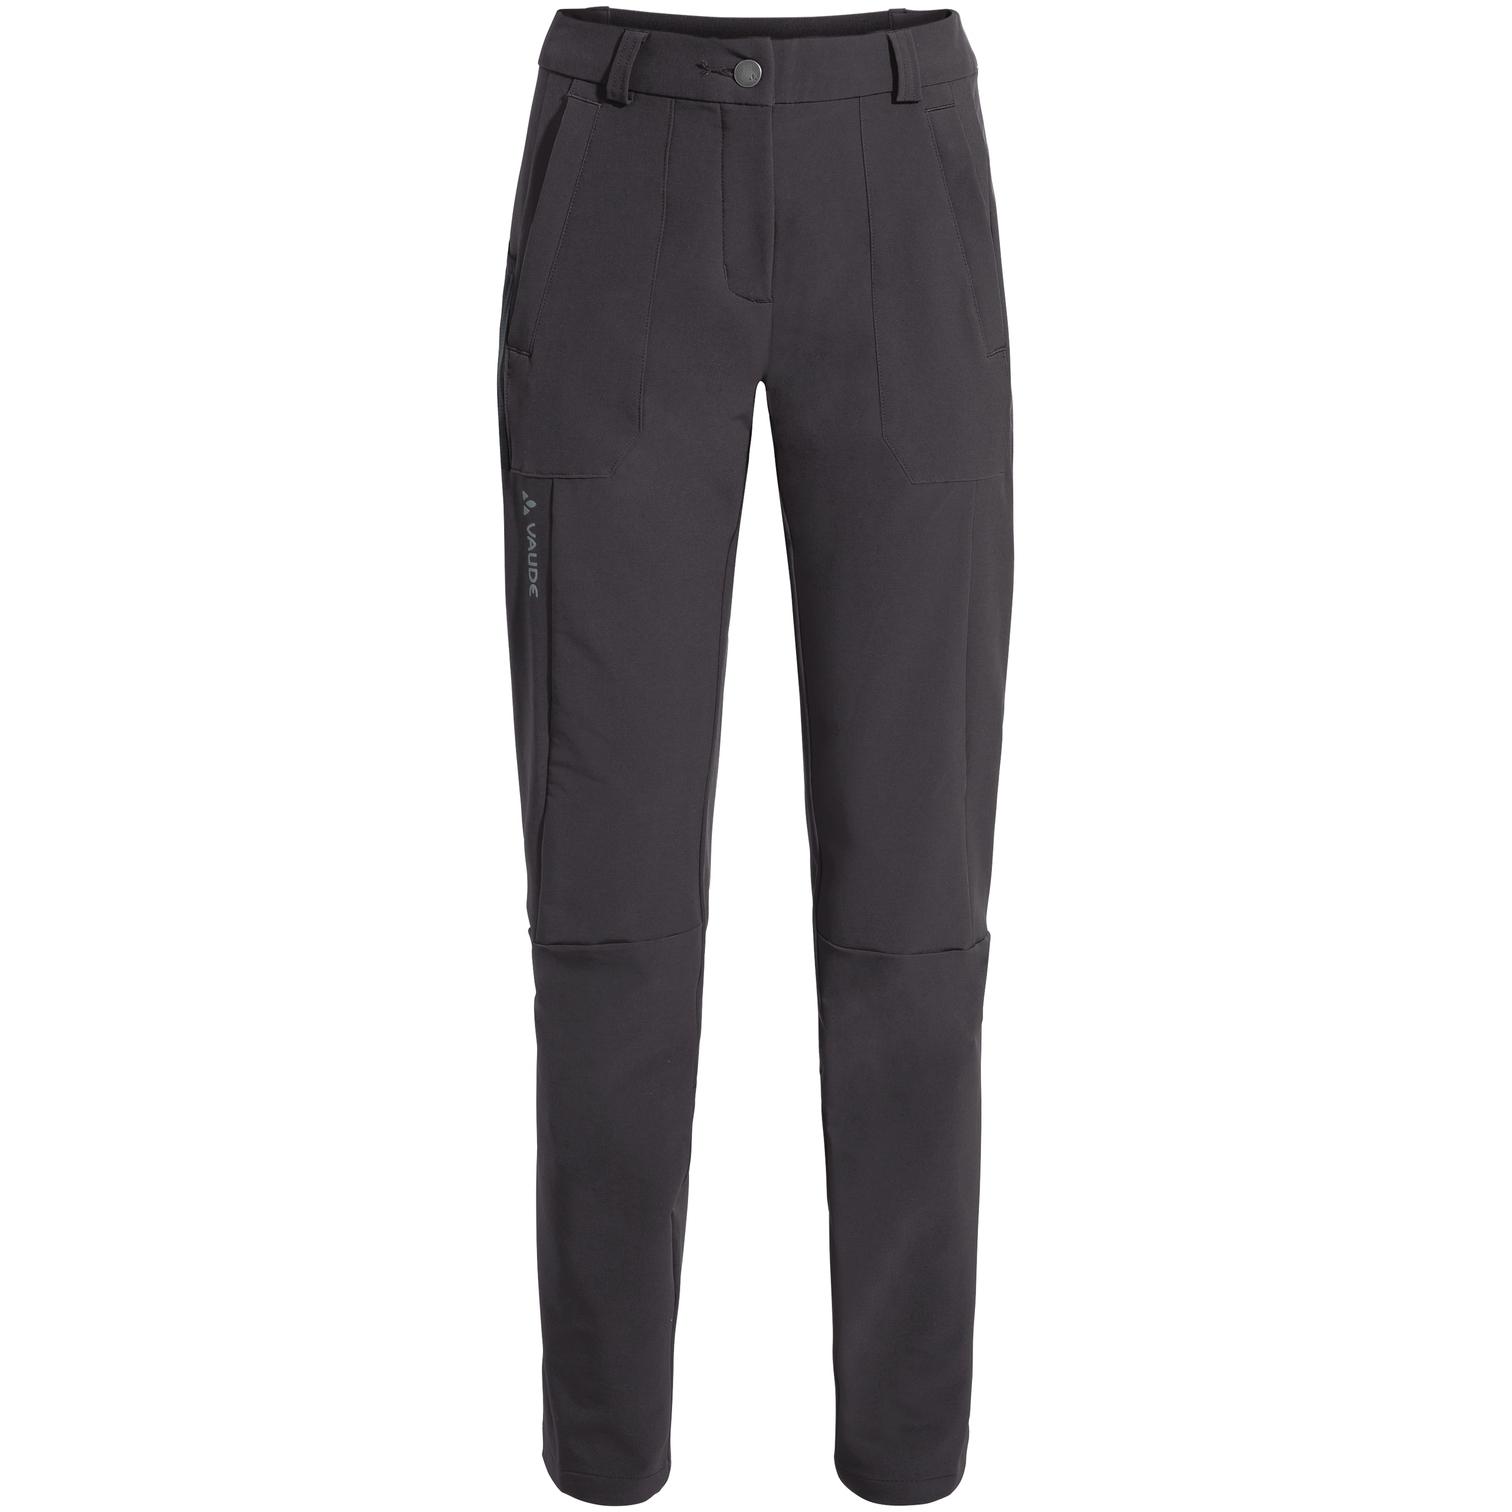 Vaude Women's Elope Slim Fit Pants - phantom black